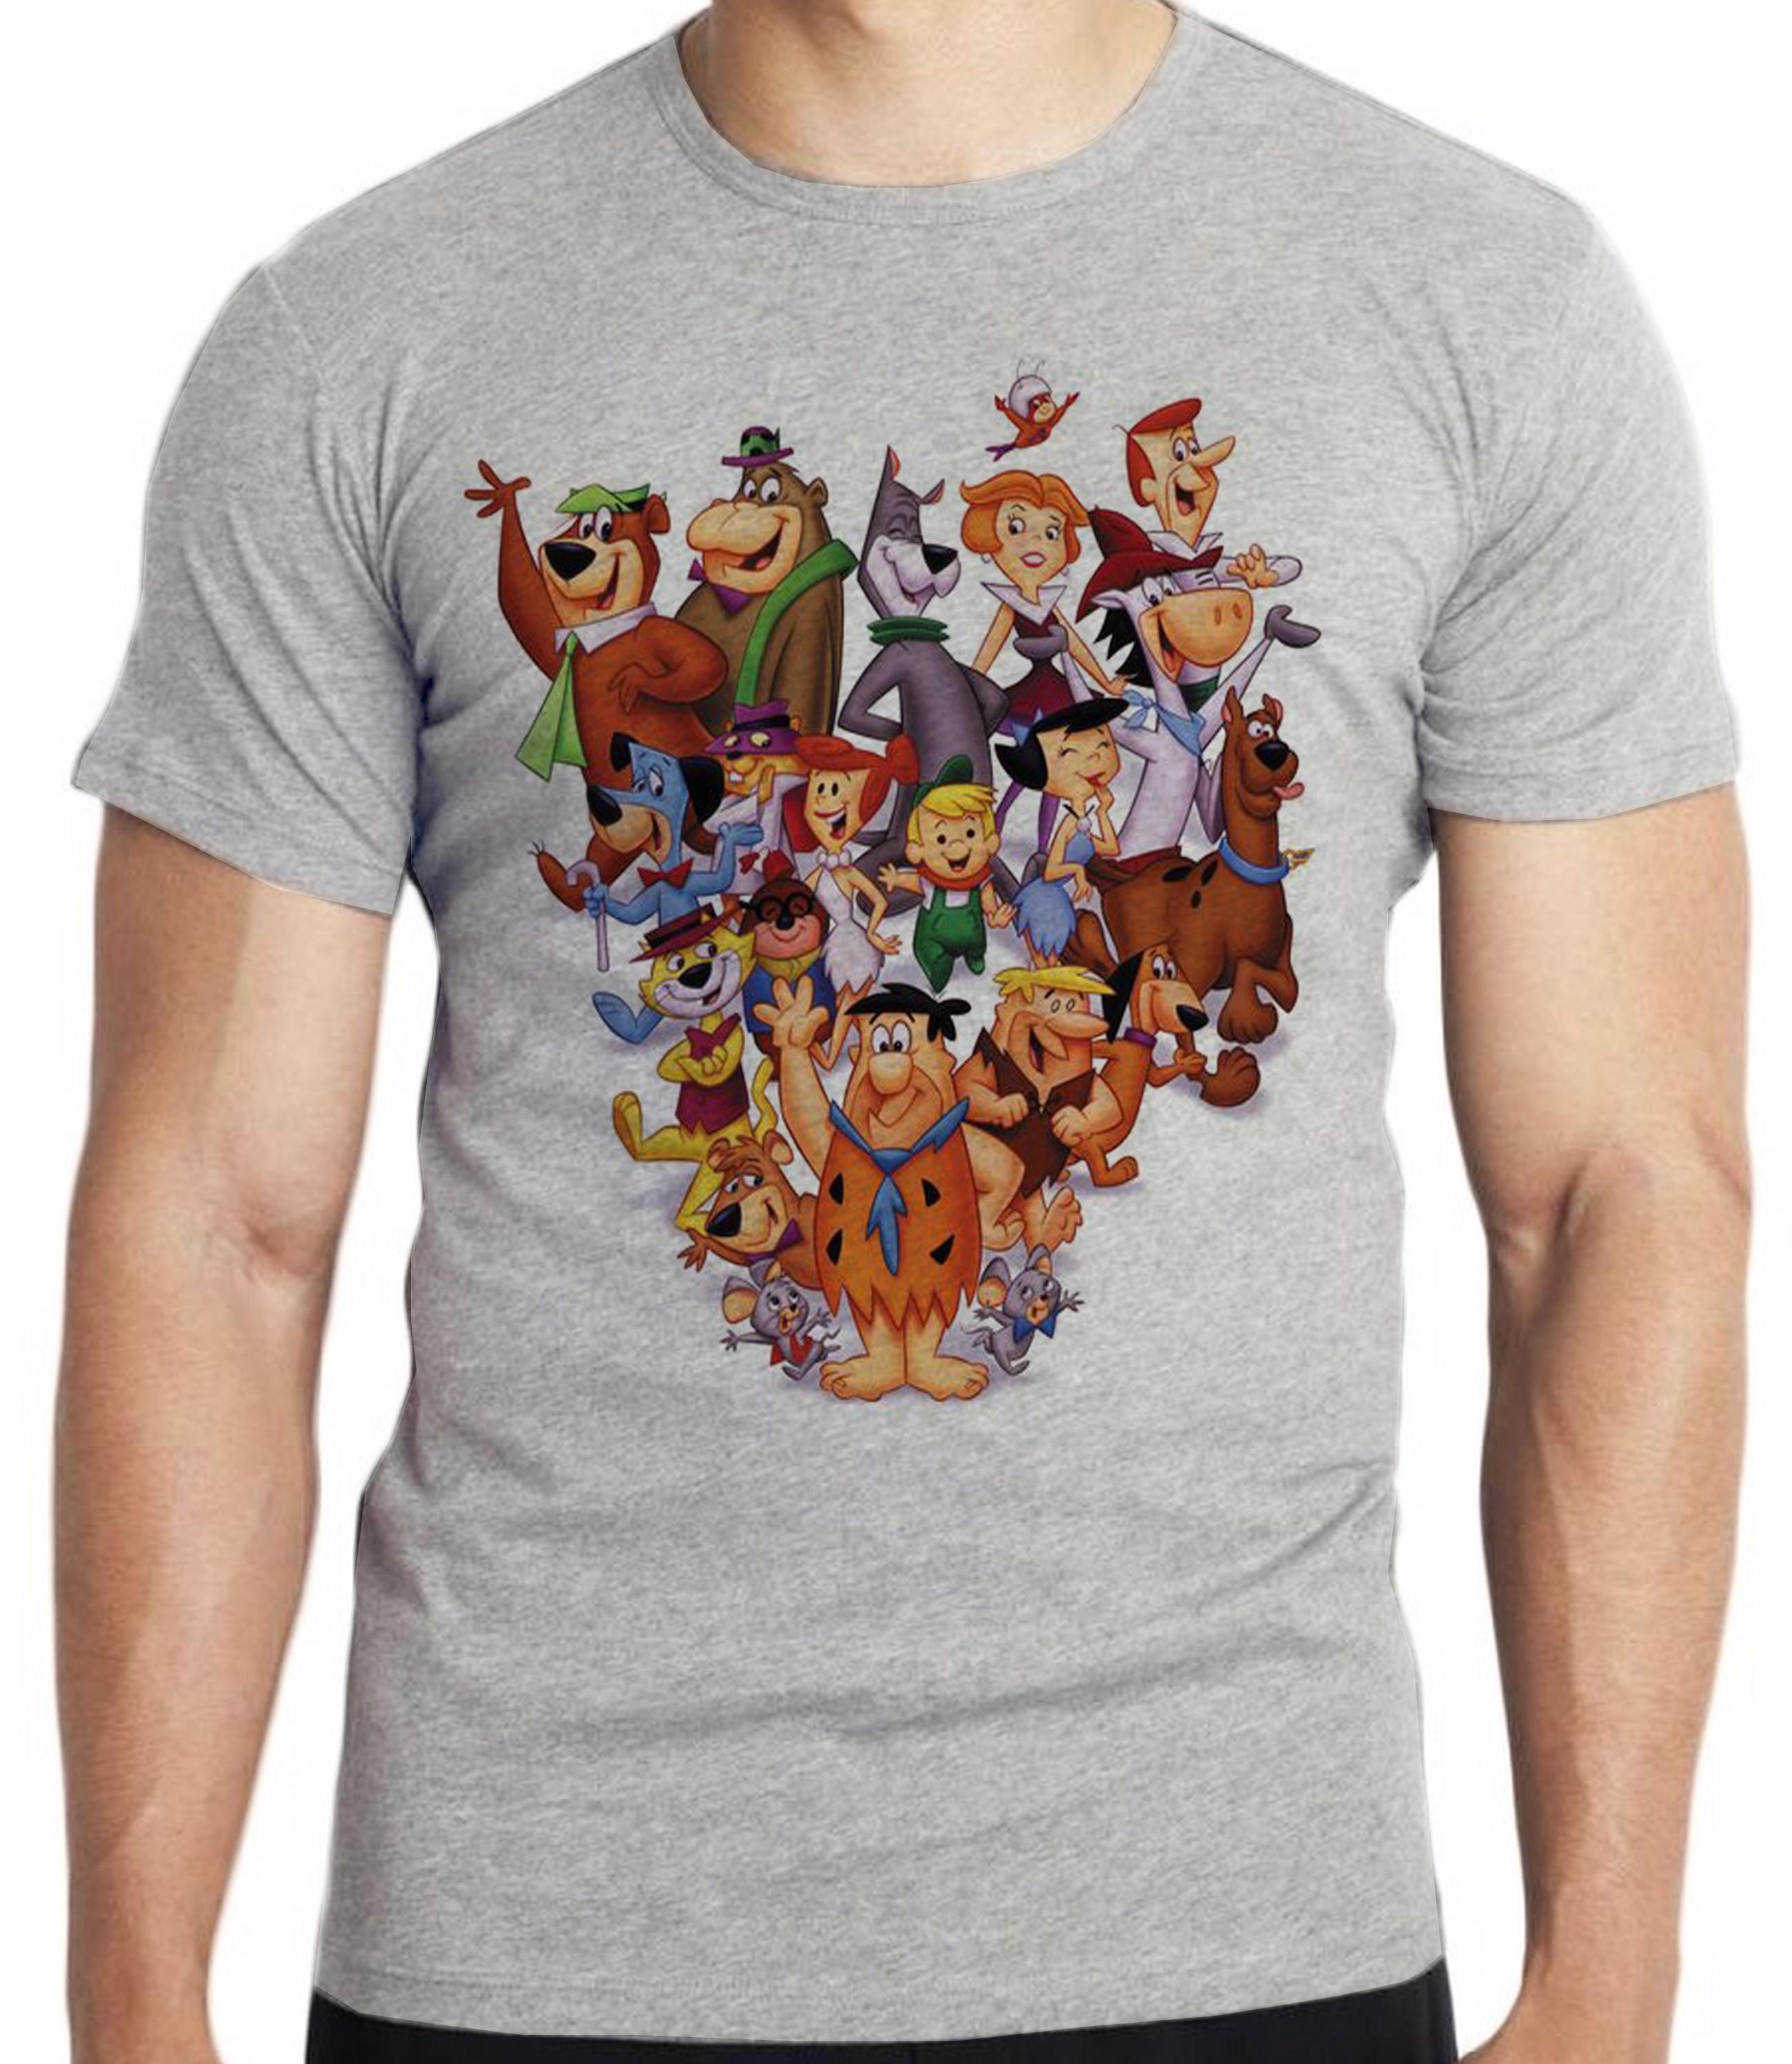 Camiseta Infantil Blusa Crianca Ze Buscape Hanna Barbera  5cbc13460068e